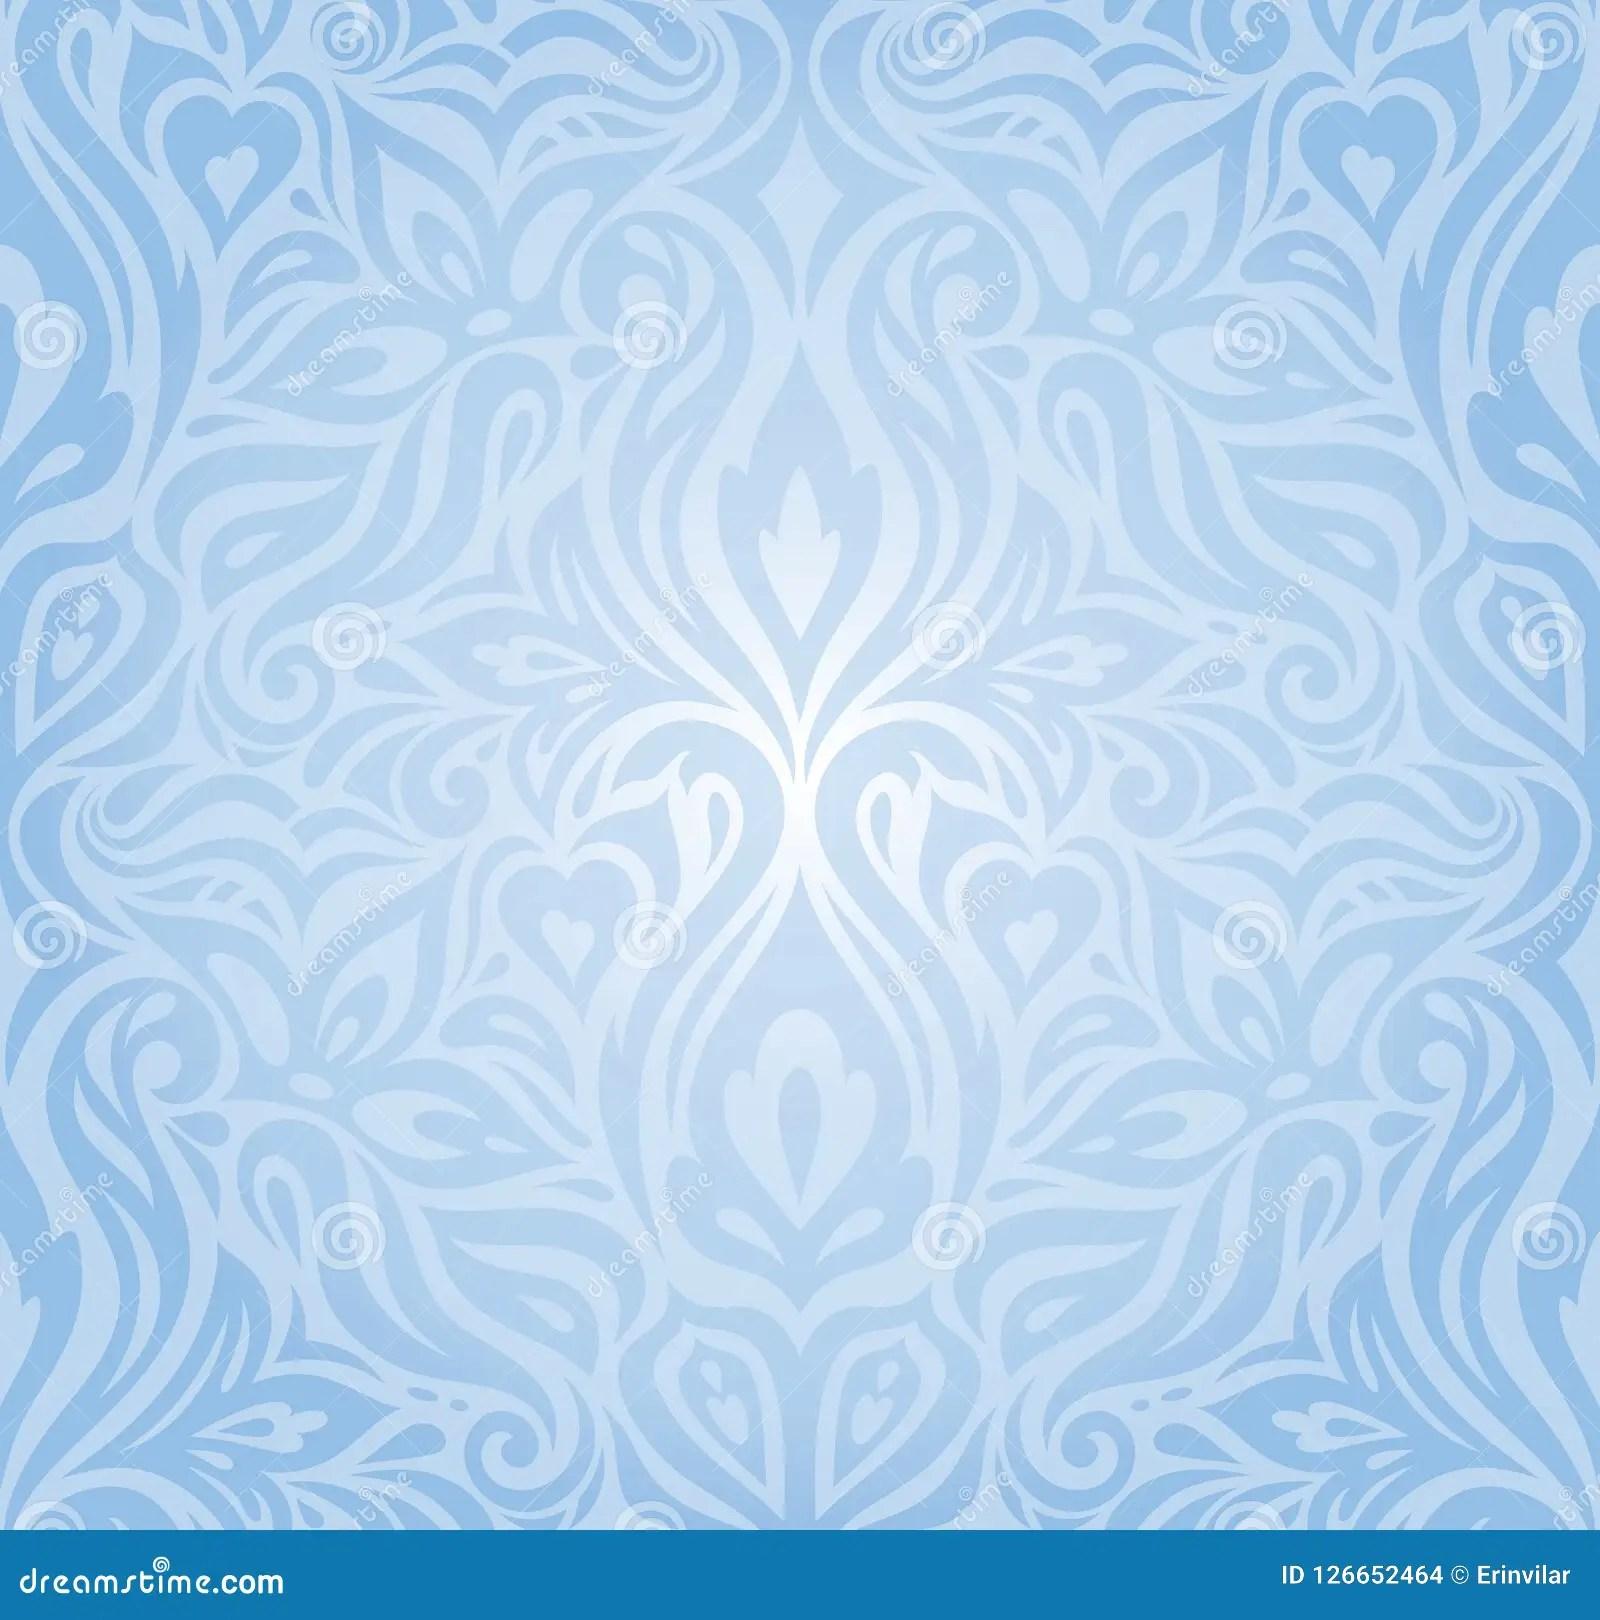 Gentle Blue Floral Vector Seamless Decorative Background Vintage Retro Wallpaper Design Stock Vector Illustration Of Flower Color 126652464